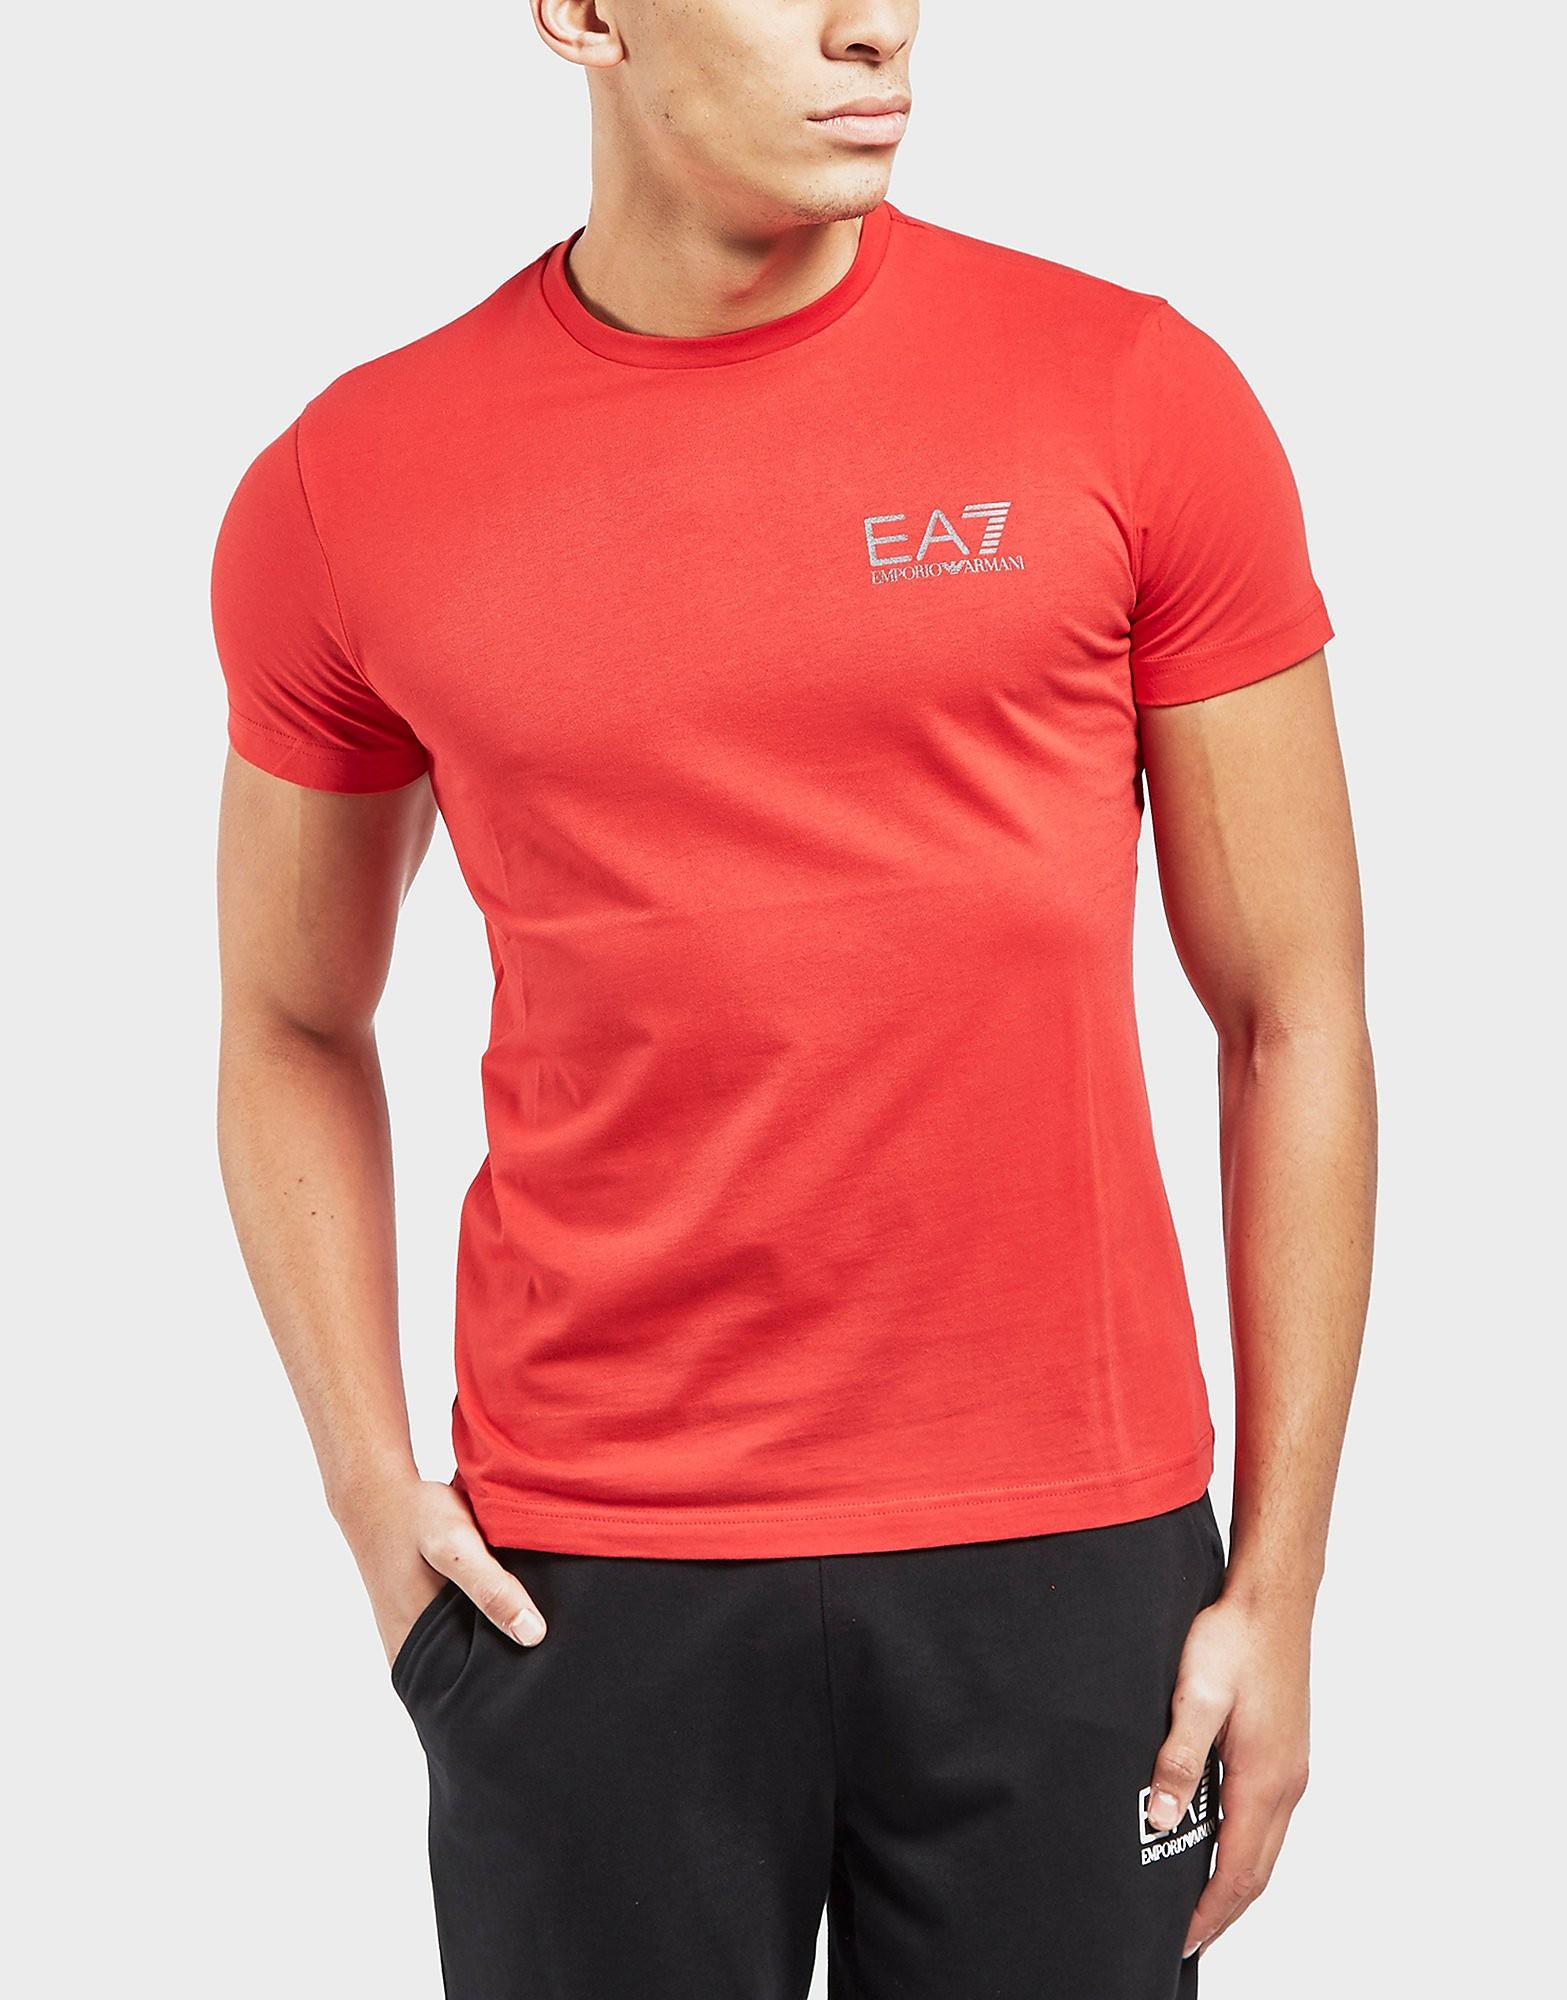 Emporio Armani EA7 Basic Short Sleeve Crew T-Shirt